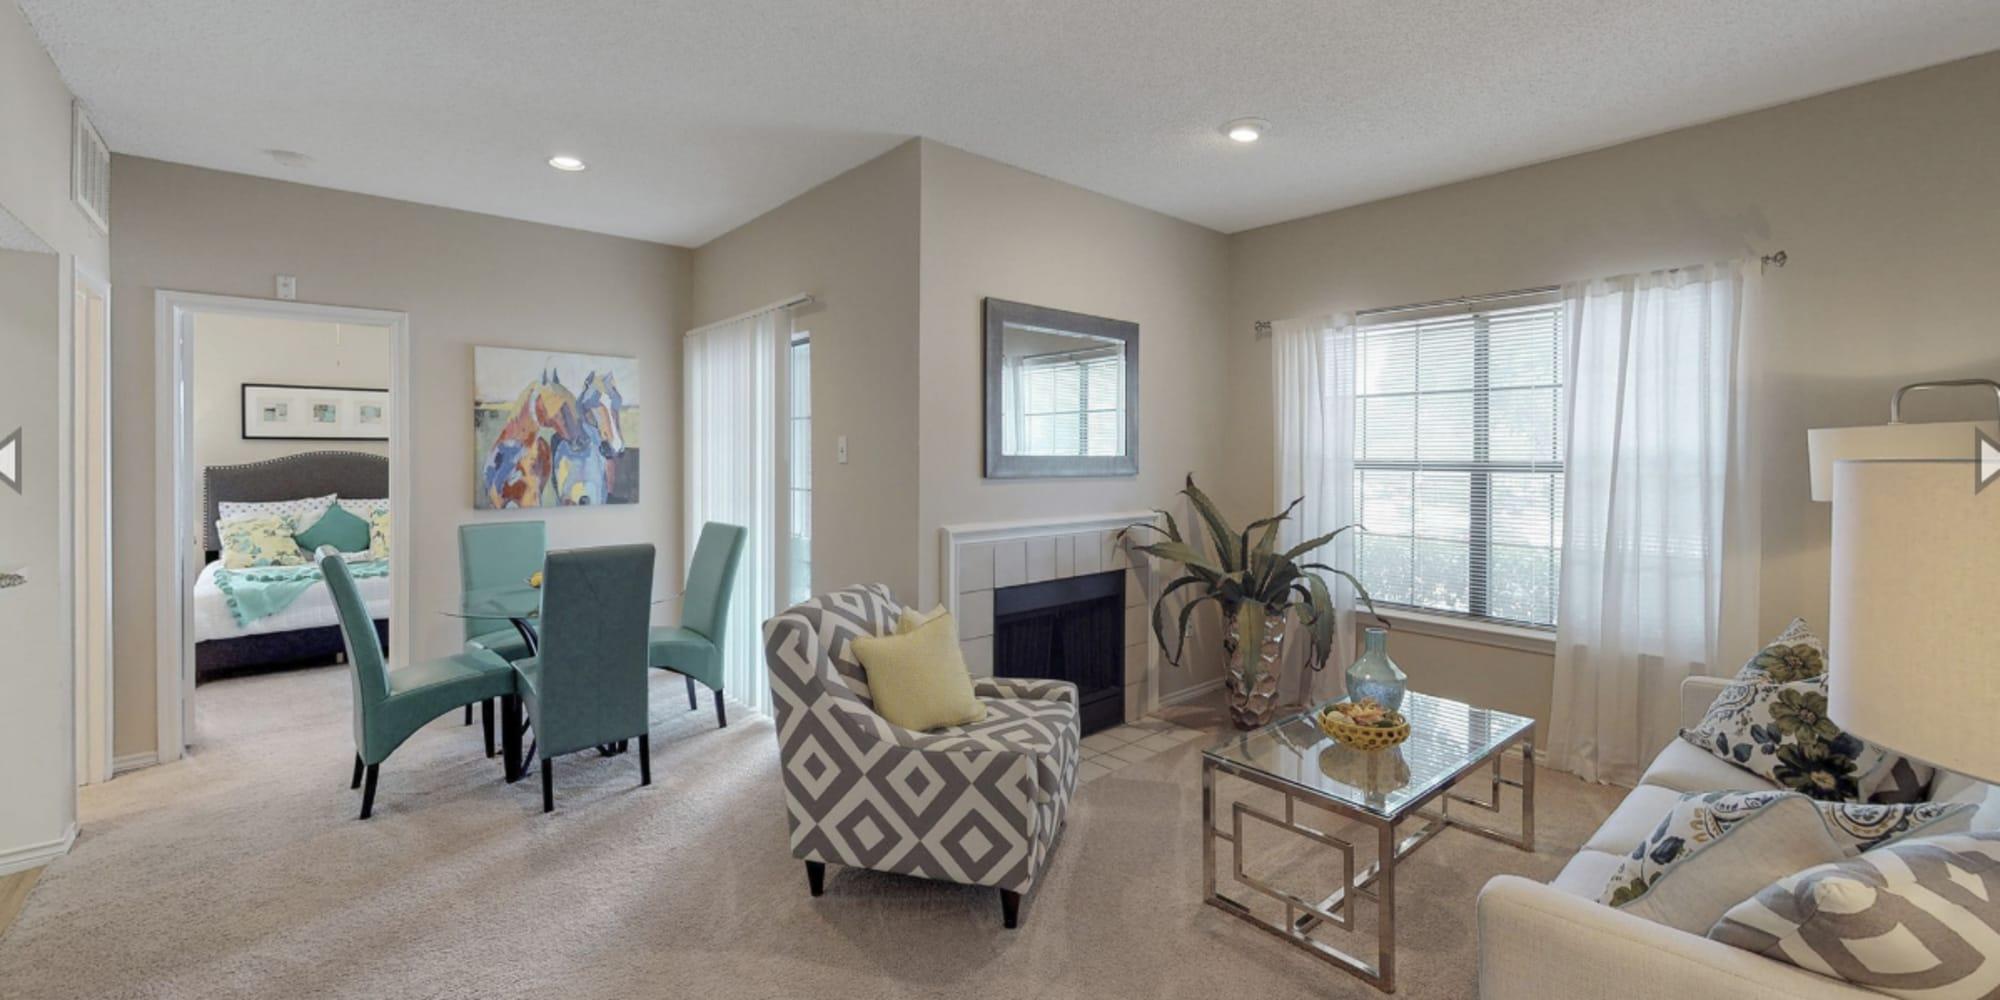 Oaks Hackberry Creek apartments in Irving, Texas